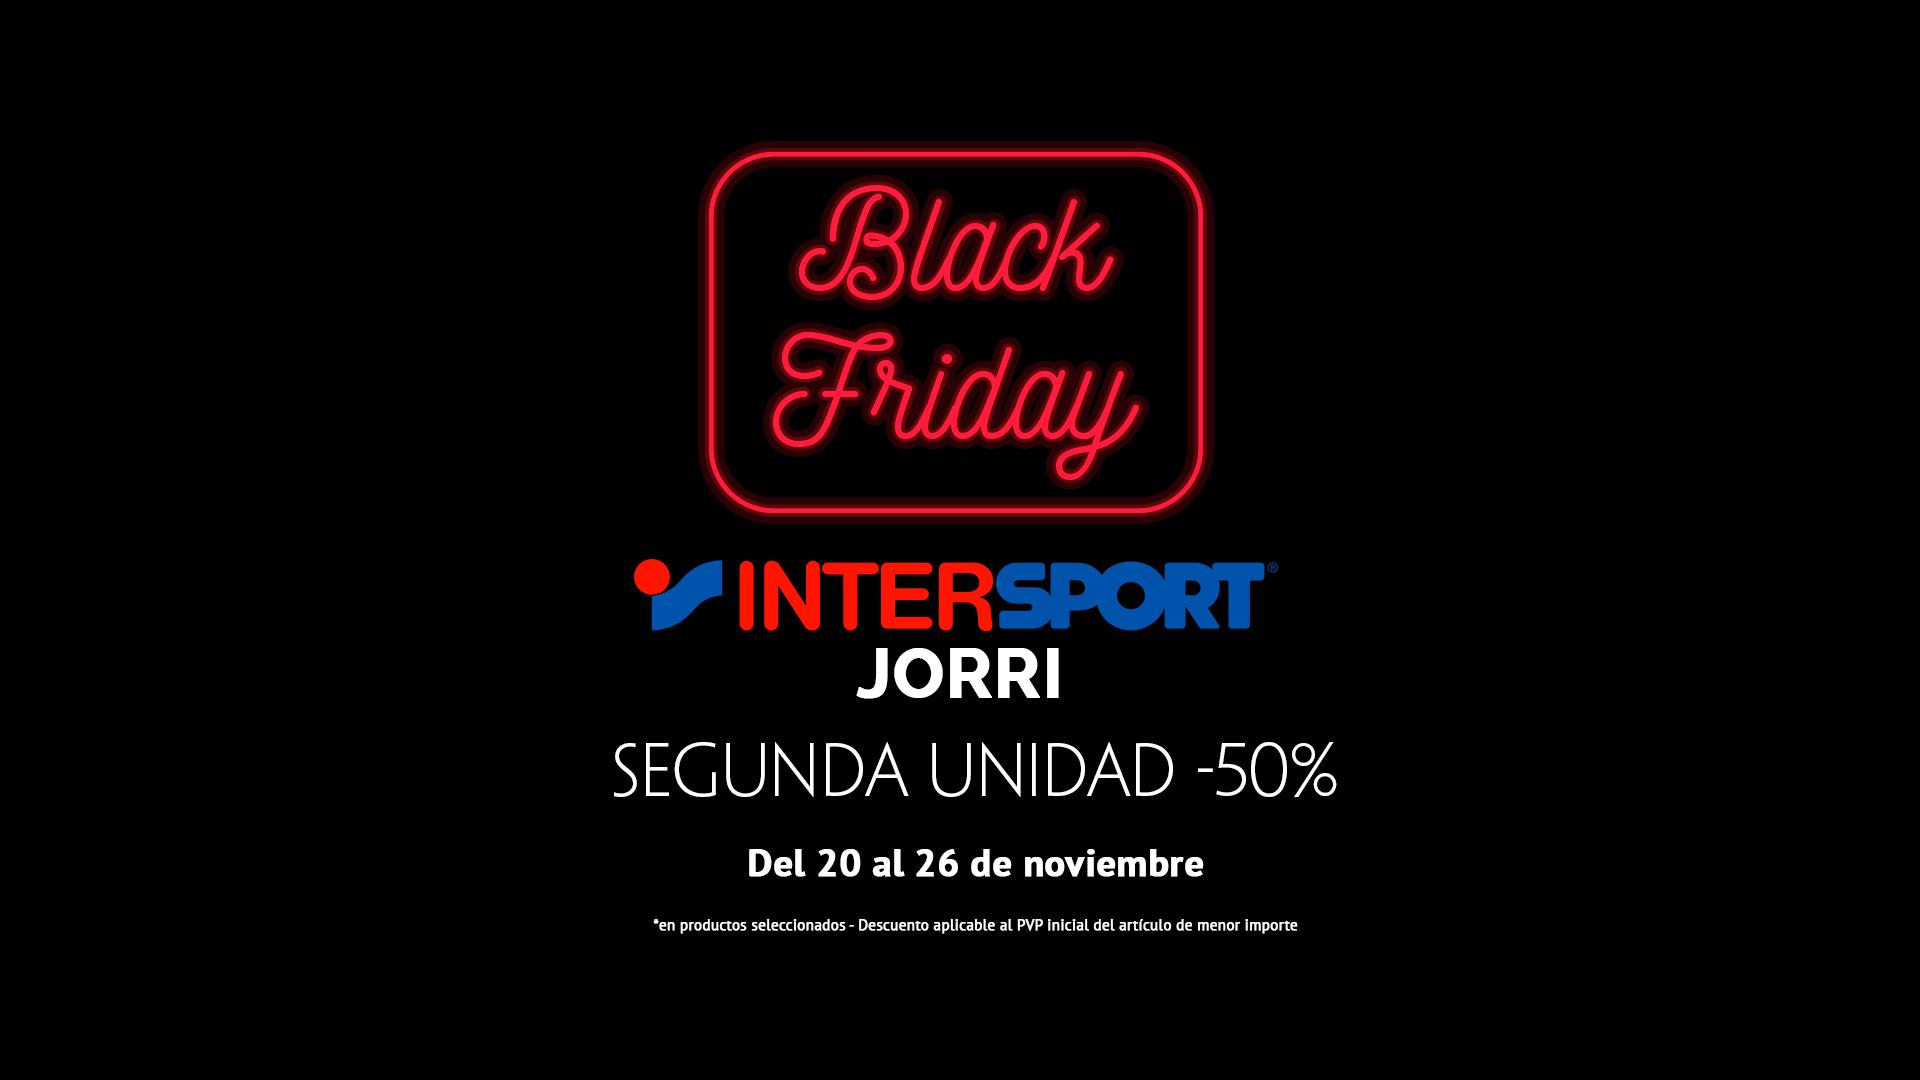 ad22cd8a12 Black Friday 2017 - Intersport Jorri Jaca